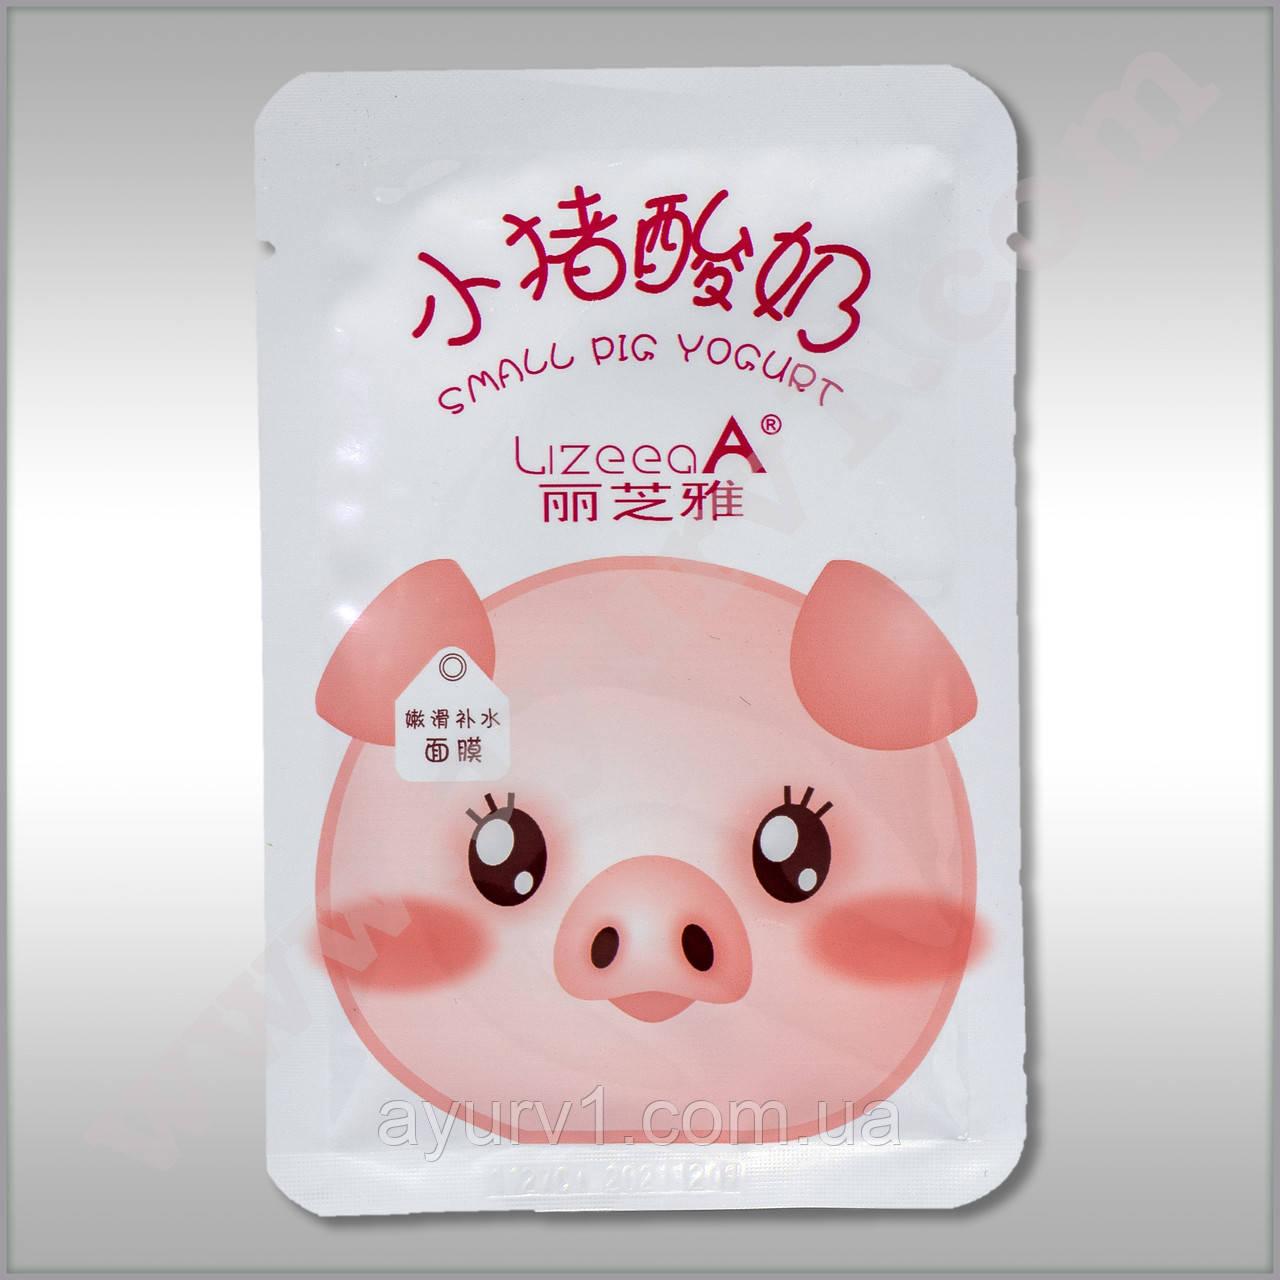 BEILINGMEI Small Pig Yogurt Smooth Moisturizing Whitening, маска для лица против морщин от прыщей 25 мл